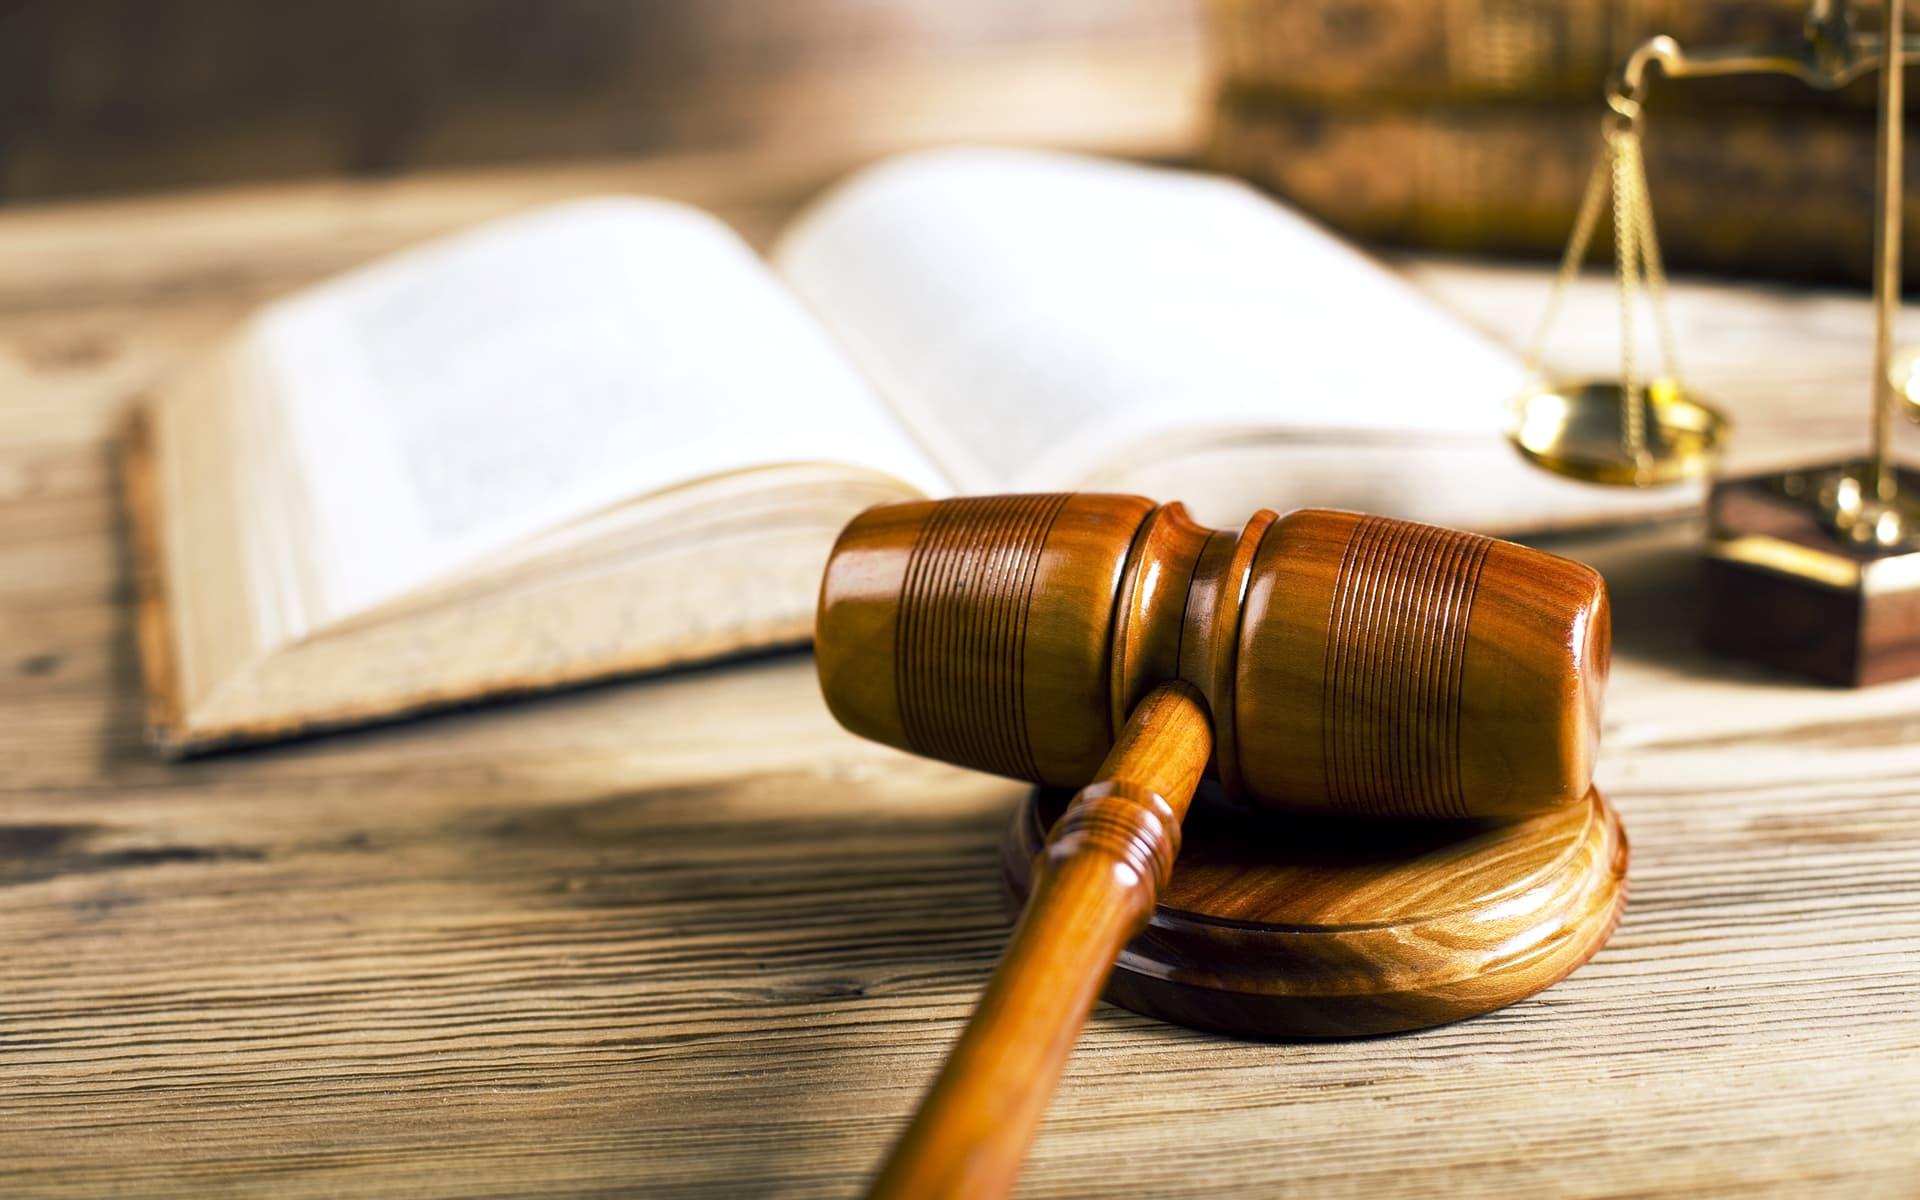 Operative Compliance - Abbildung Hammer, Waage und Gesetzbuch